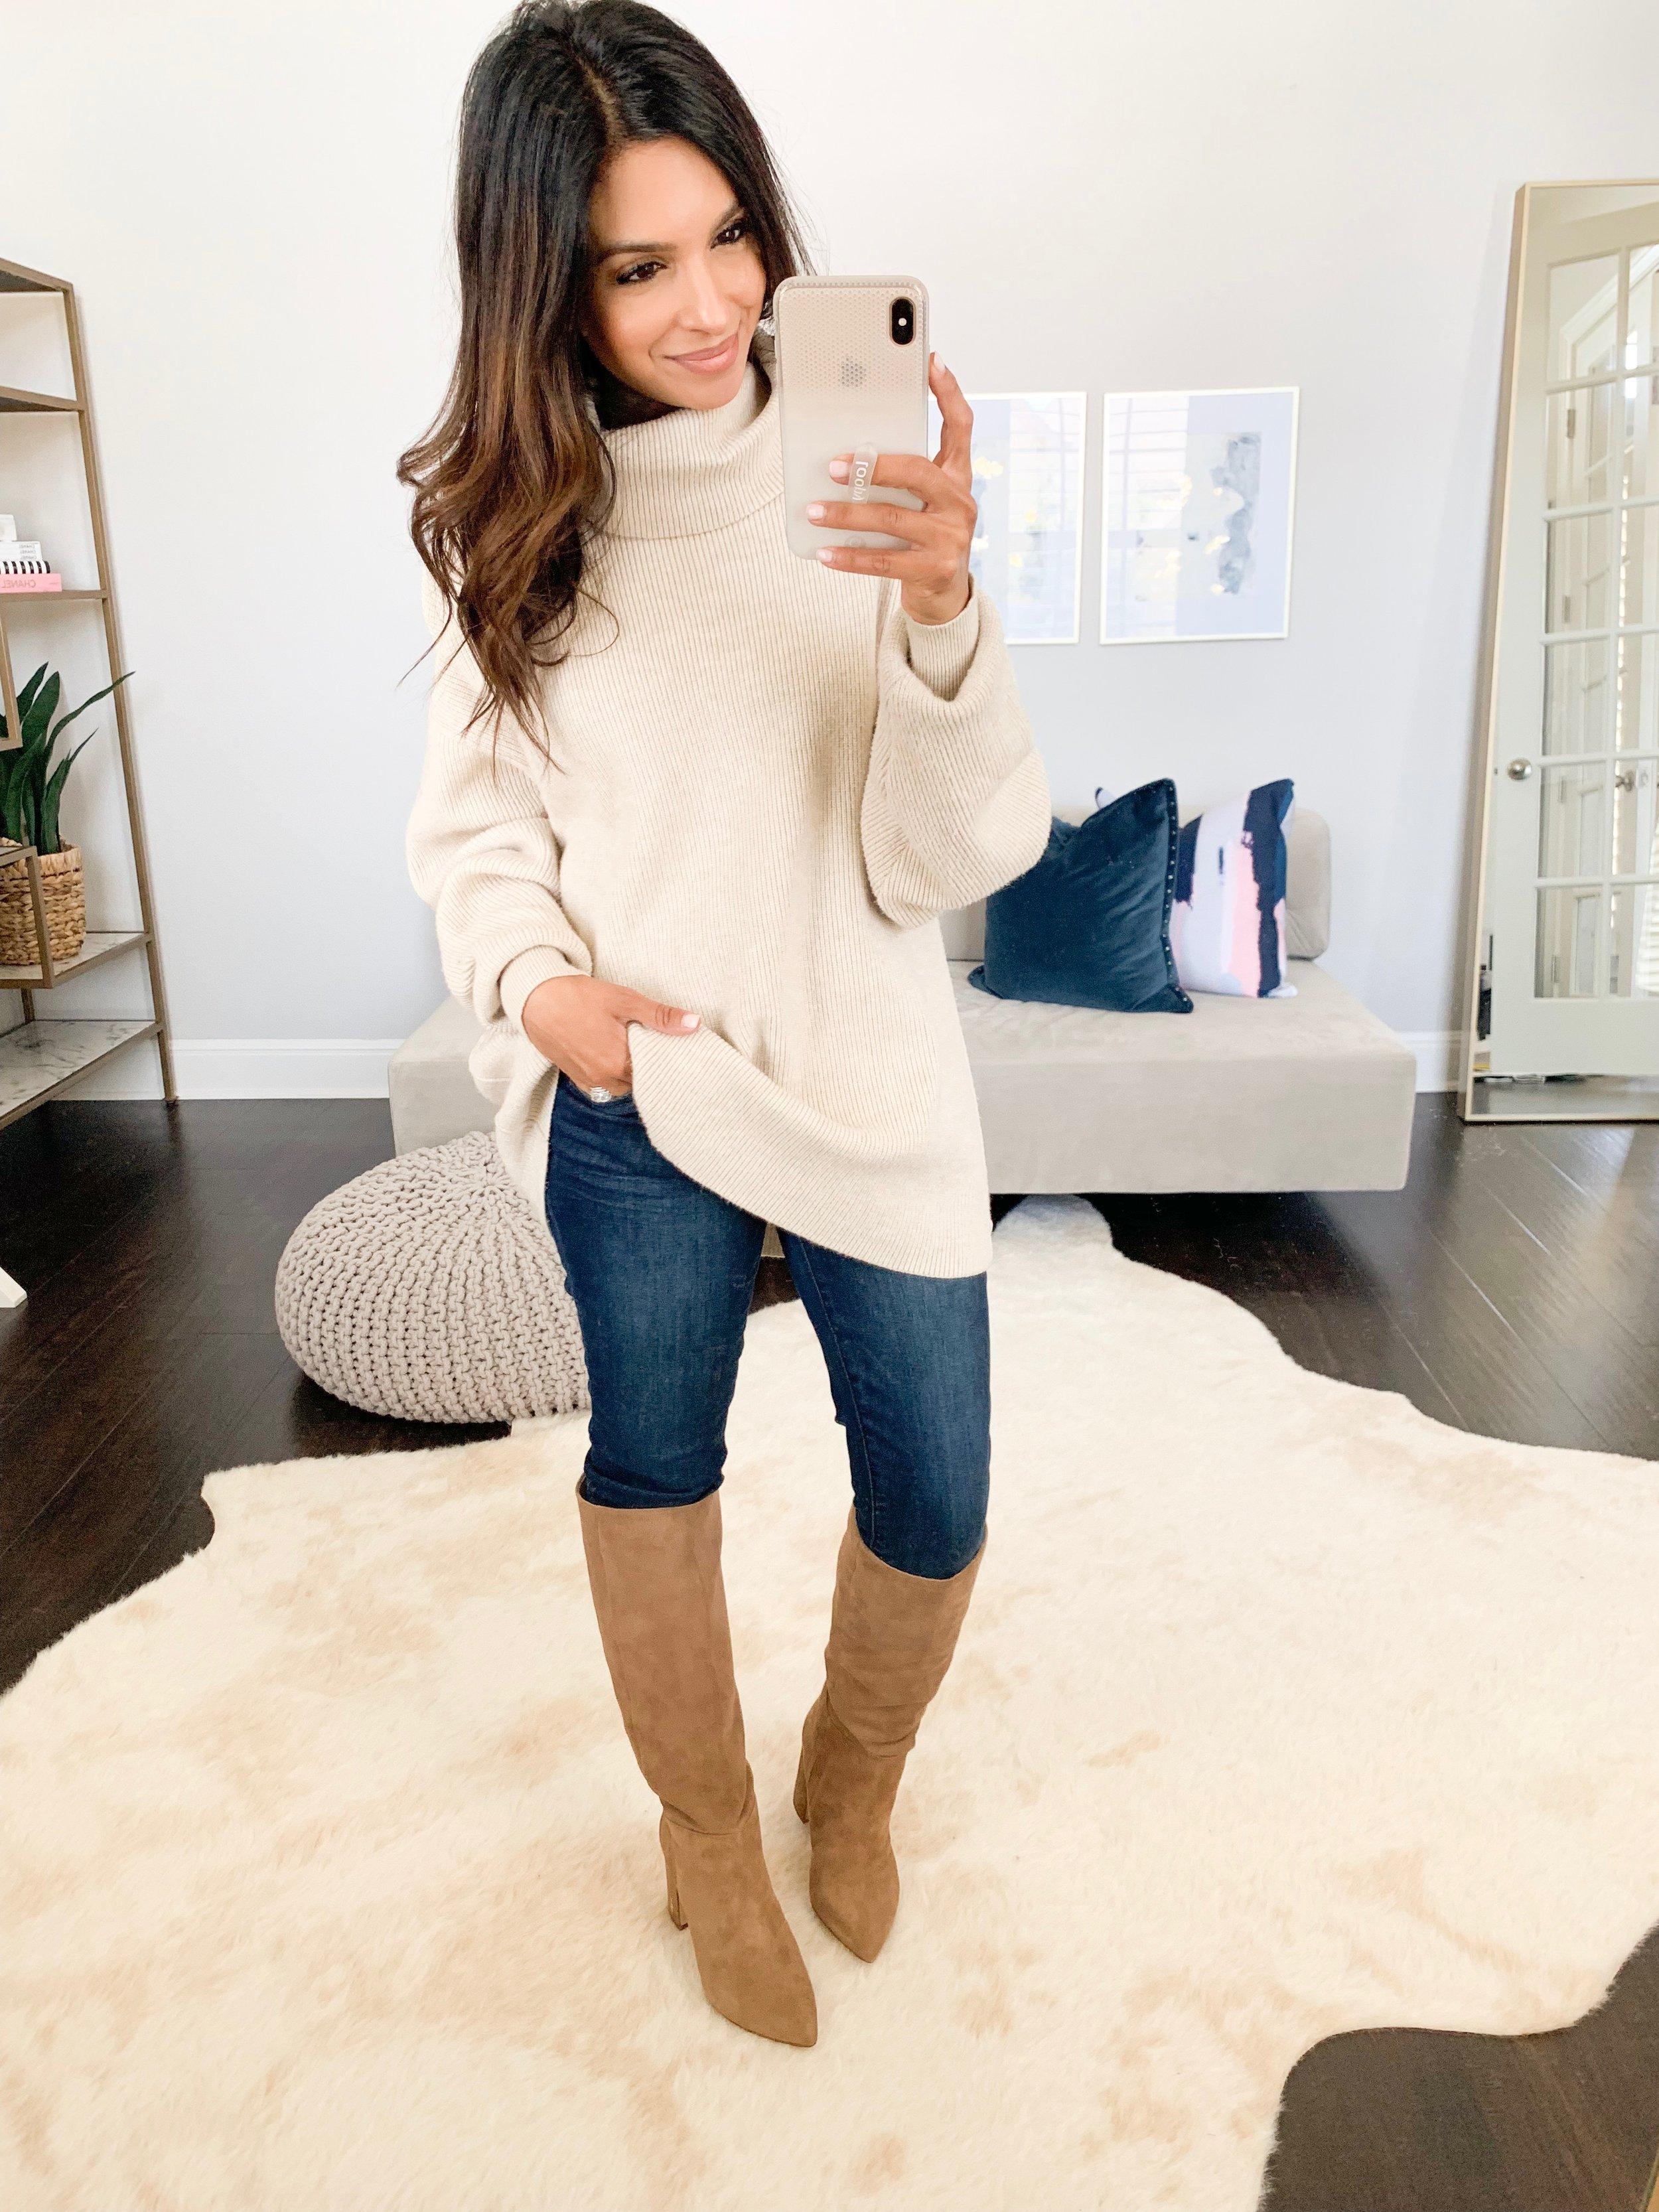 Tunic Sweater (XS)    //    Jeans (TTS)    //    Boots (TTS)